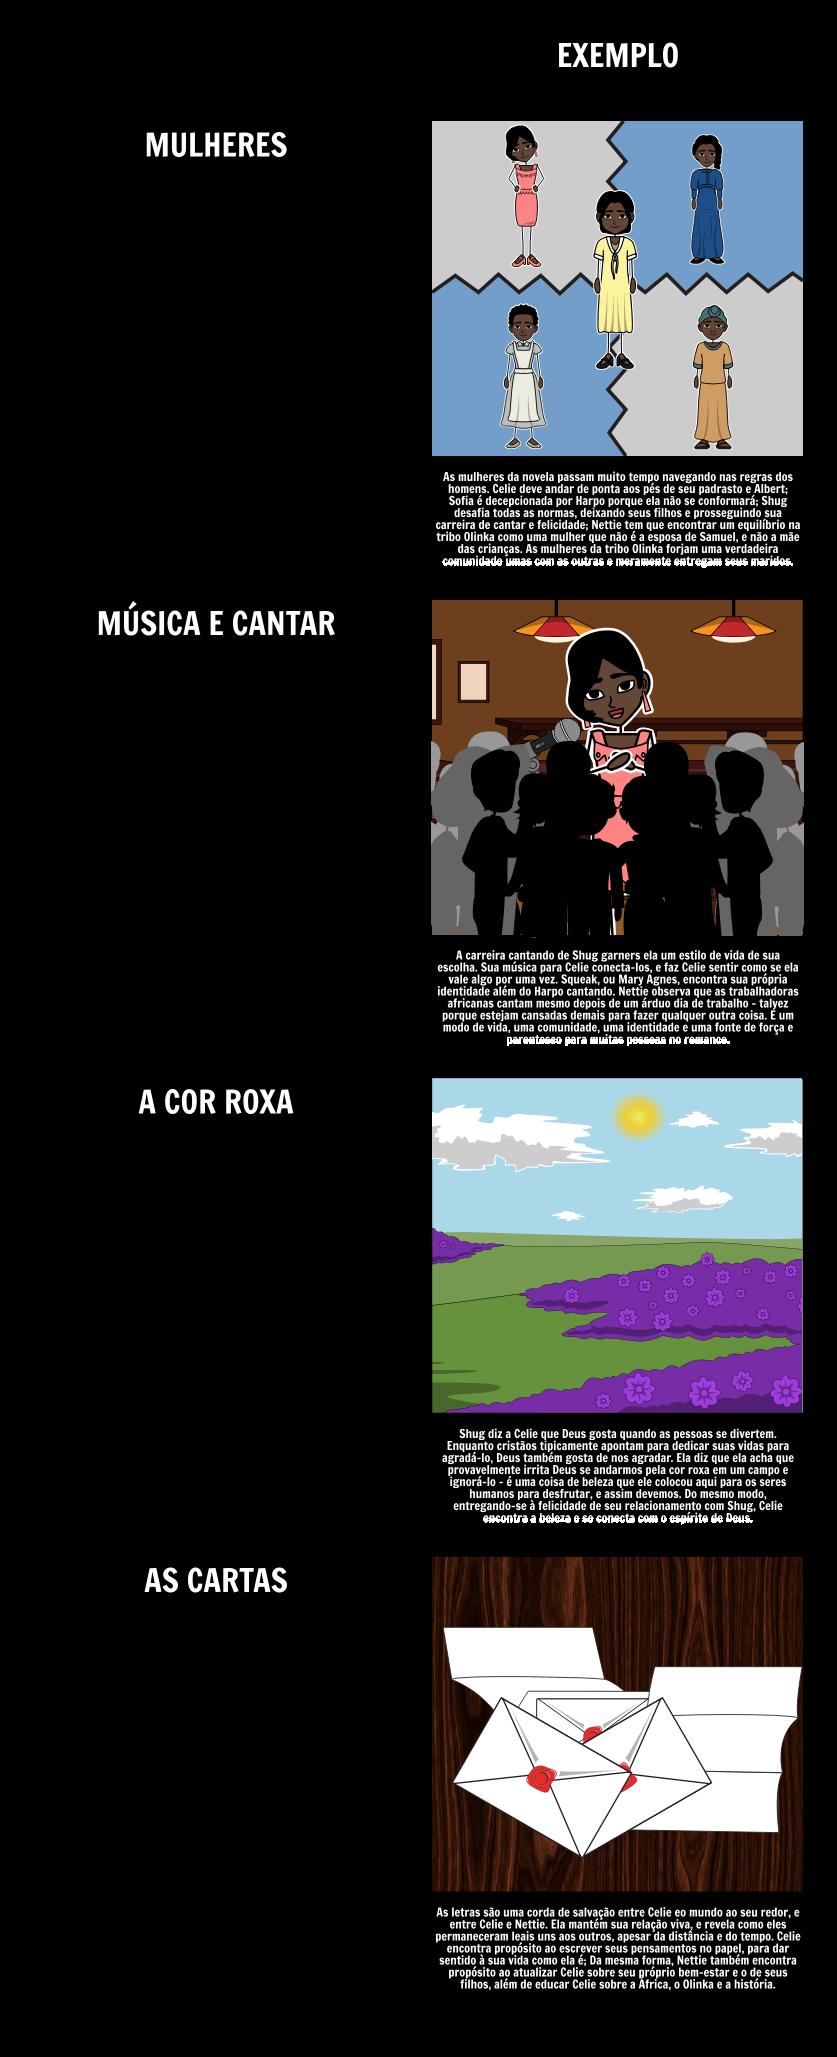 Temas, Símbolos e Motivos na cor Roxa